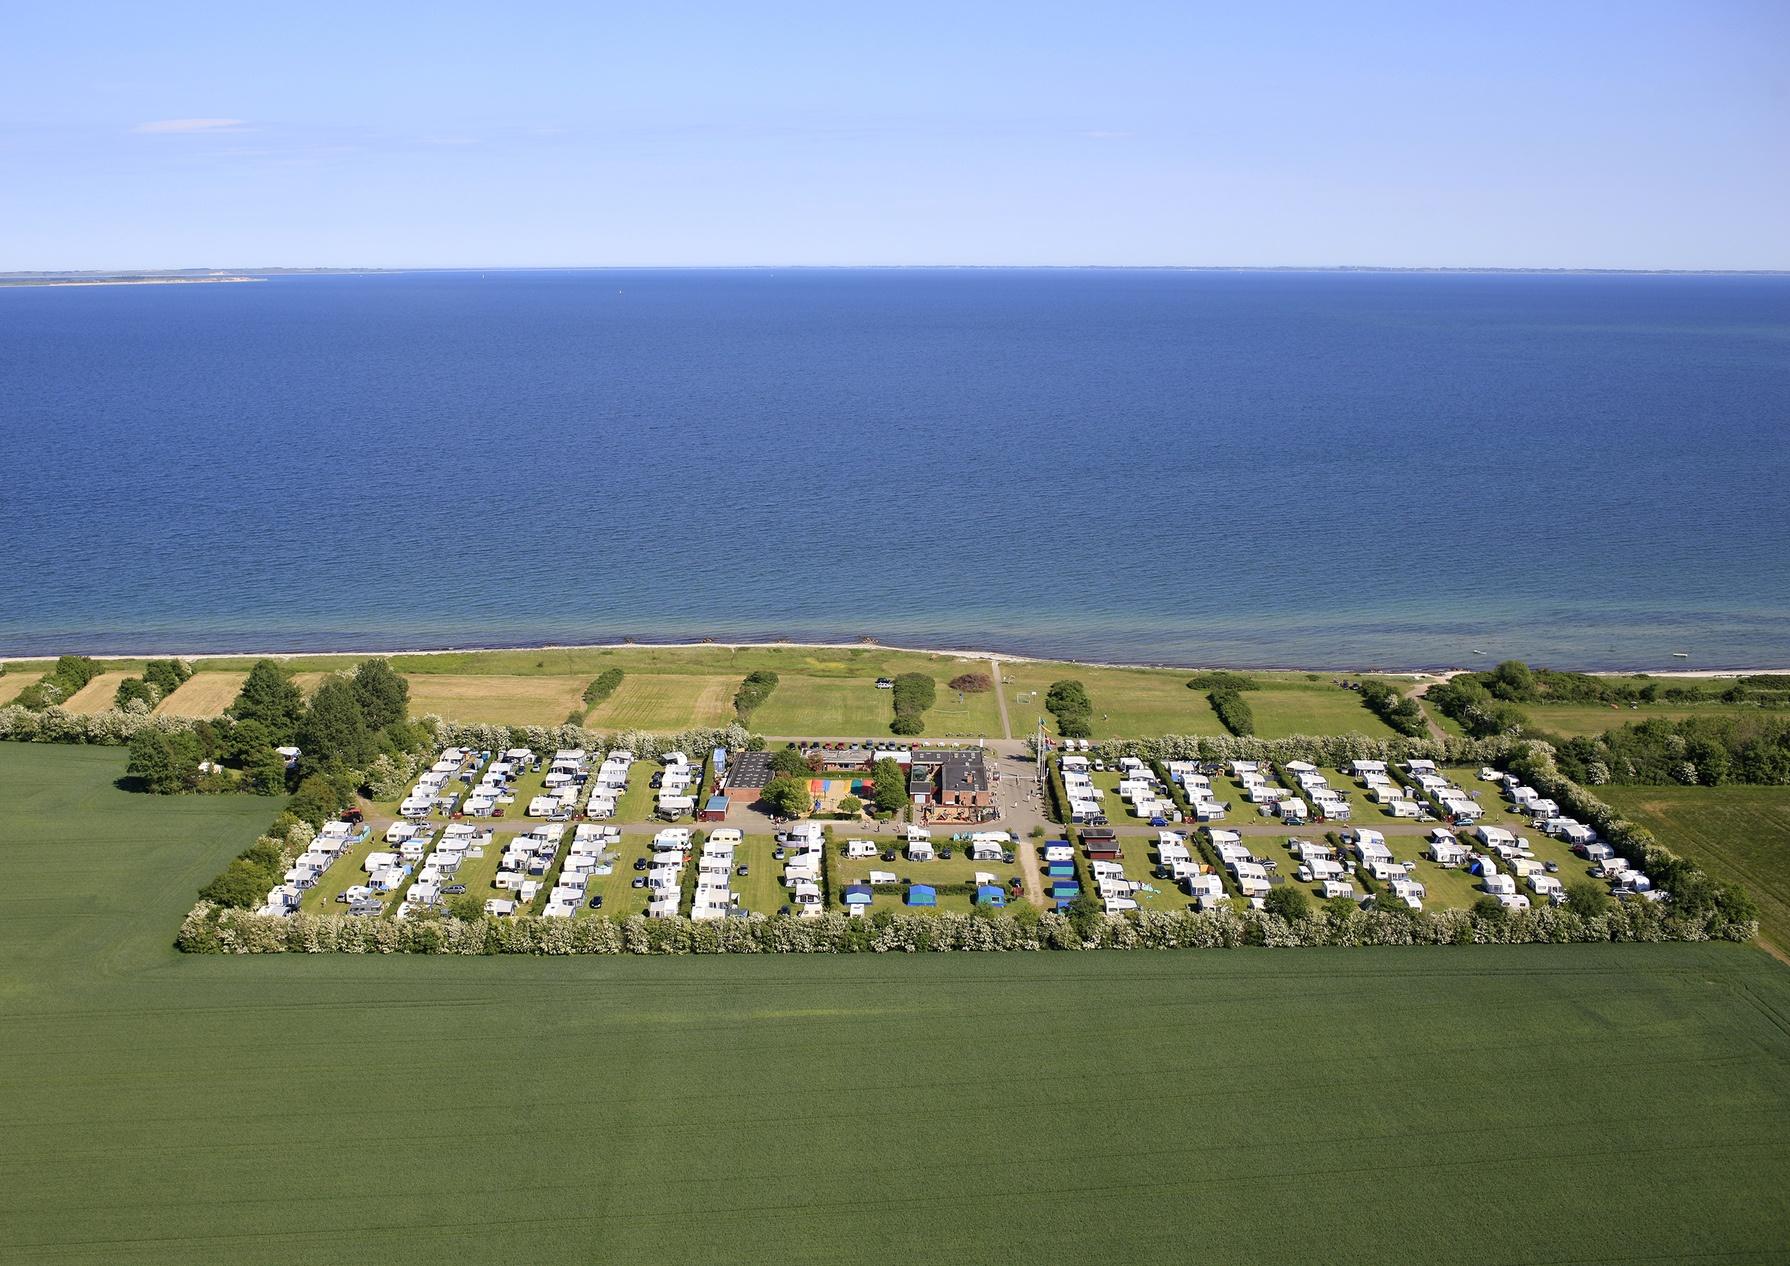 Camping Odder Strand